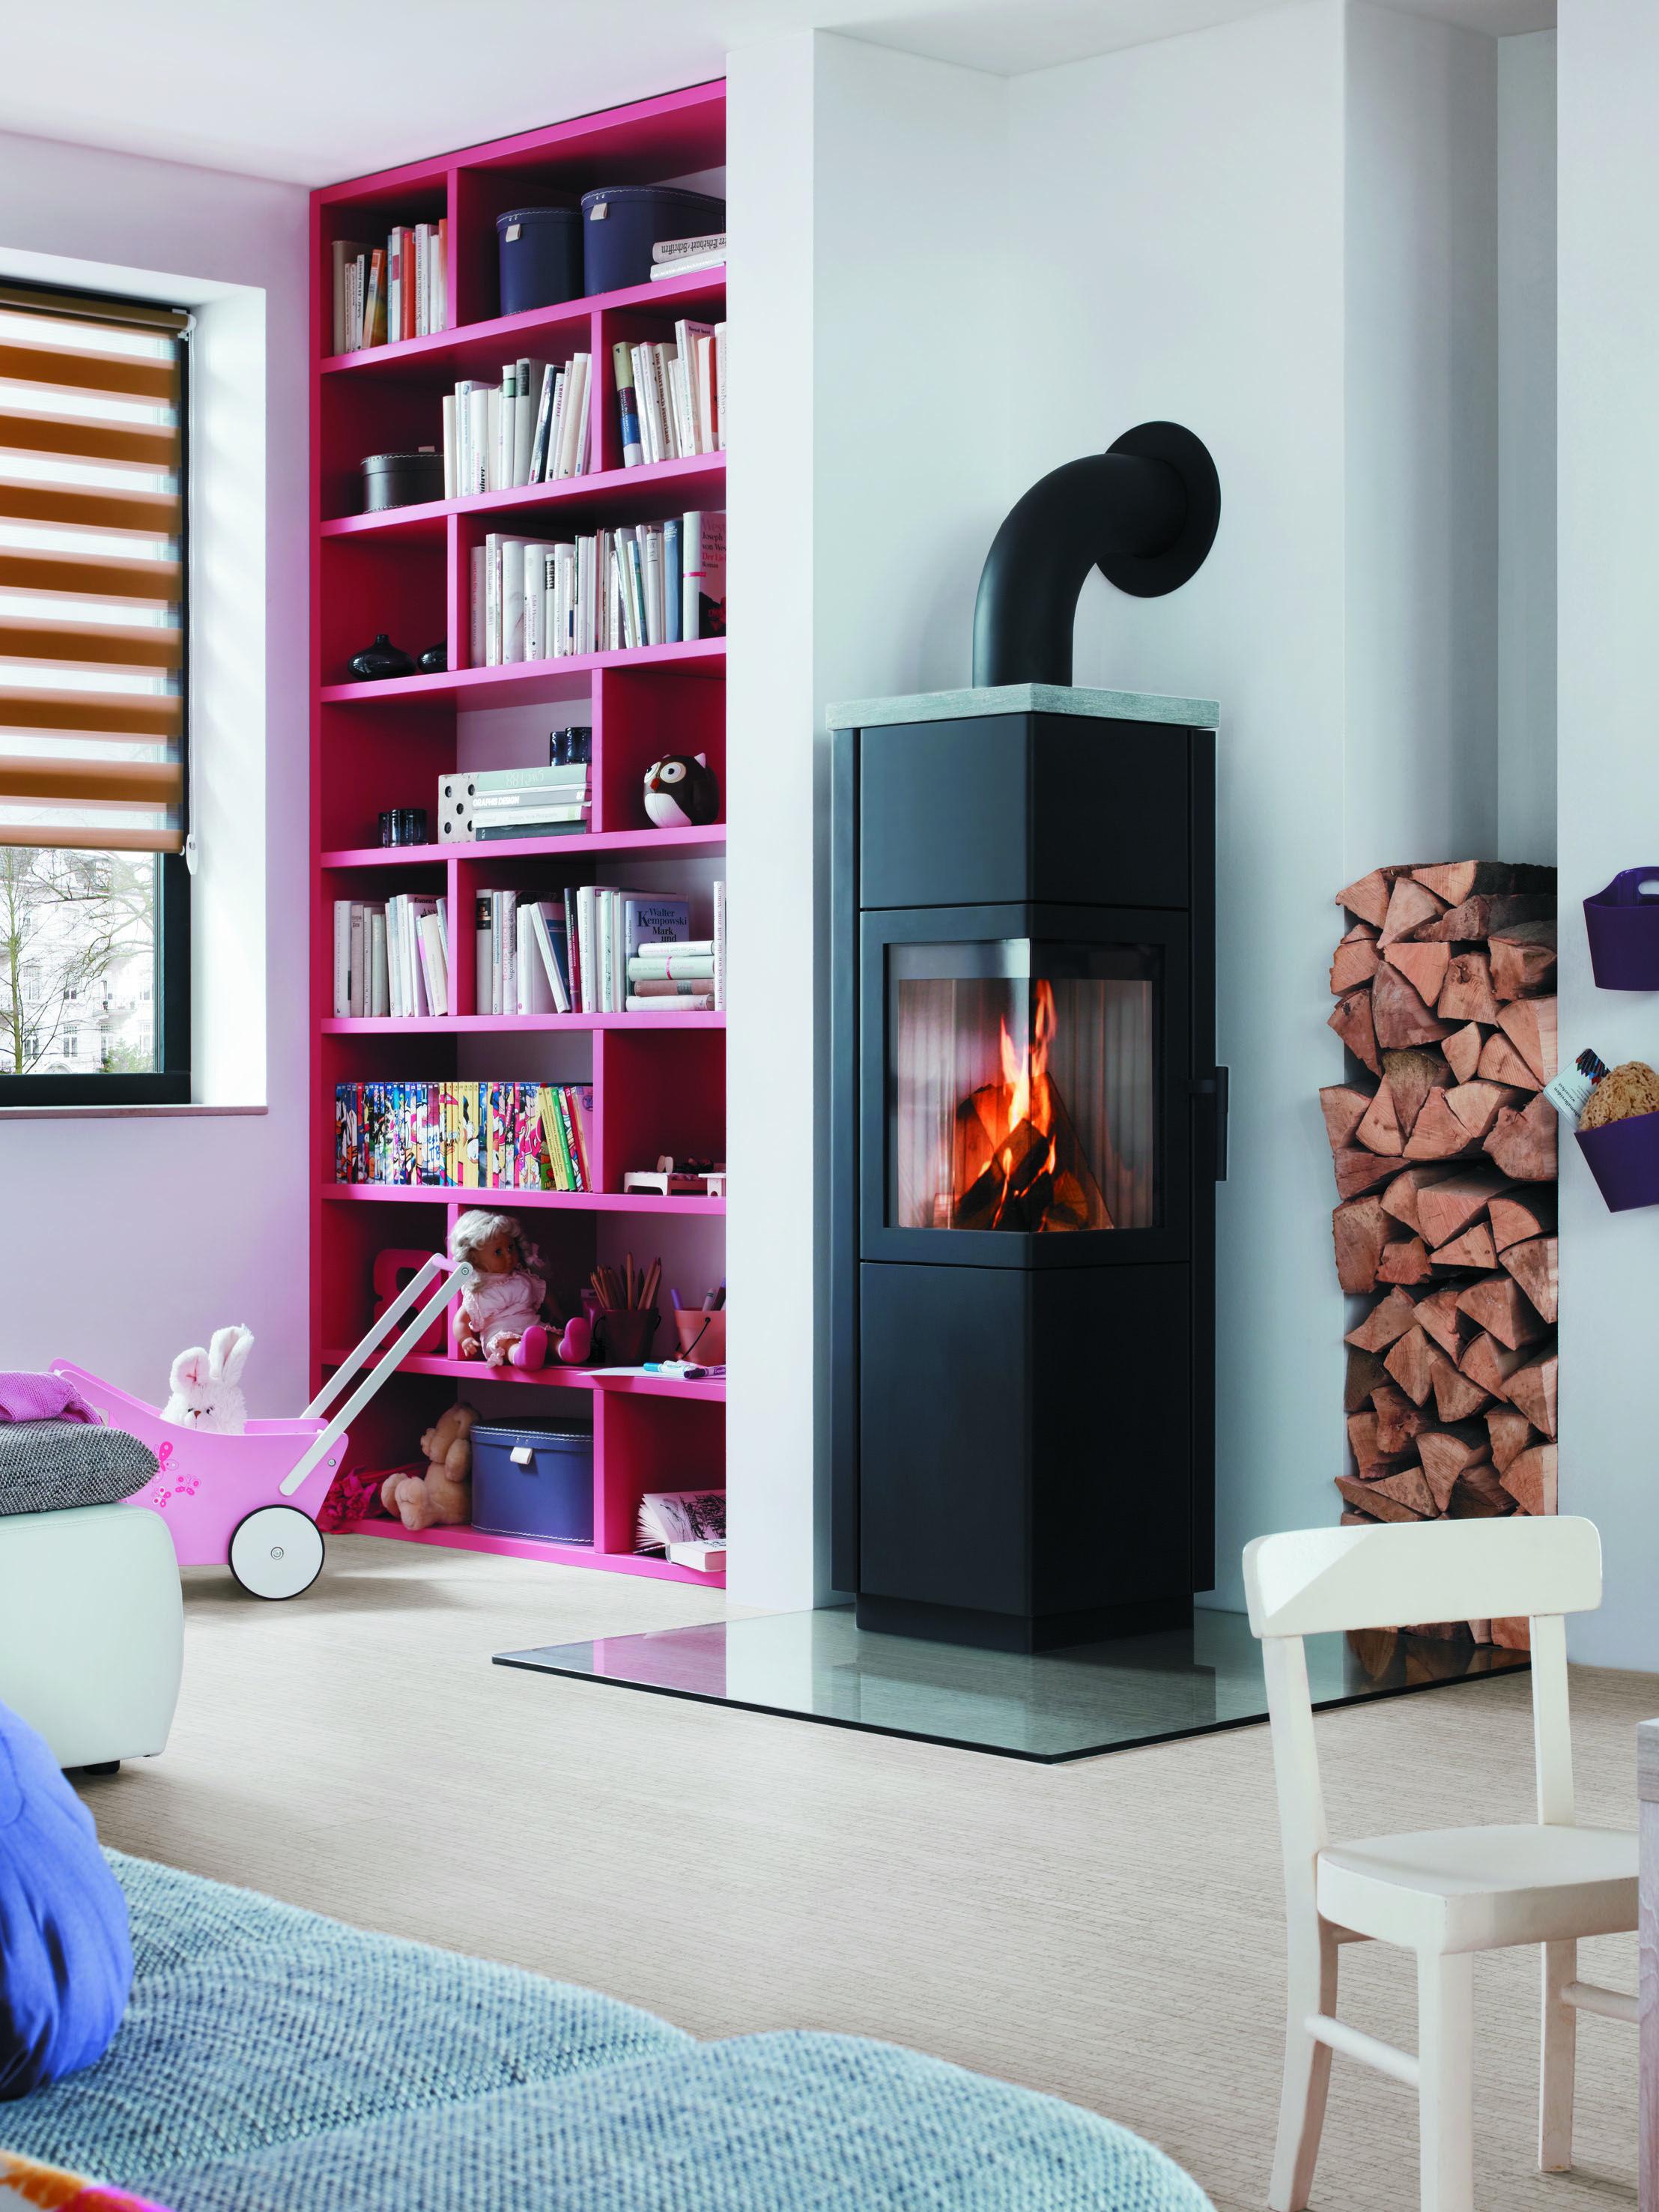 kaminofen hark 112 kompakter kaminofen f r die raumecke around the house pinterest. Black Bedroom Furniture Sets. Home Design Ideas